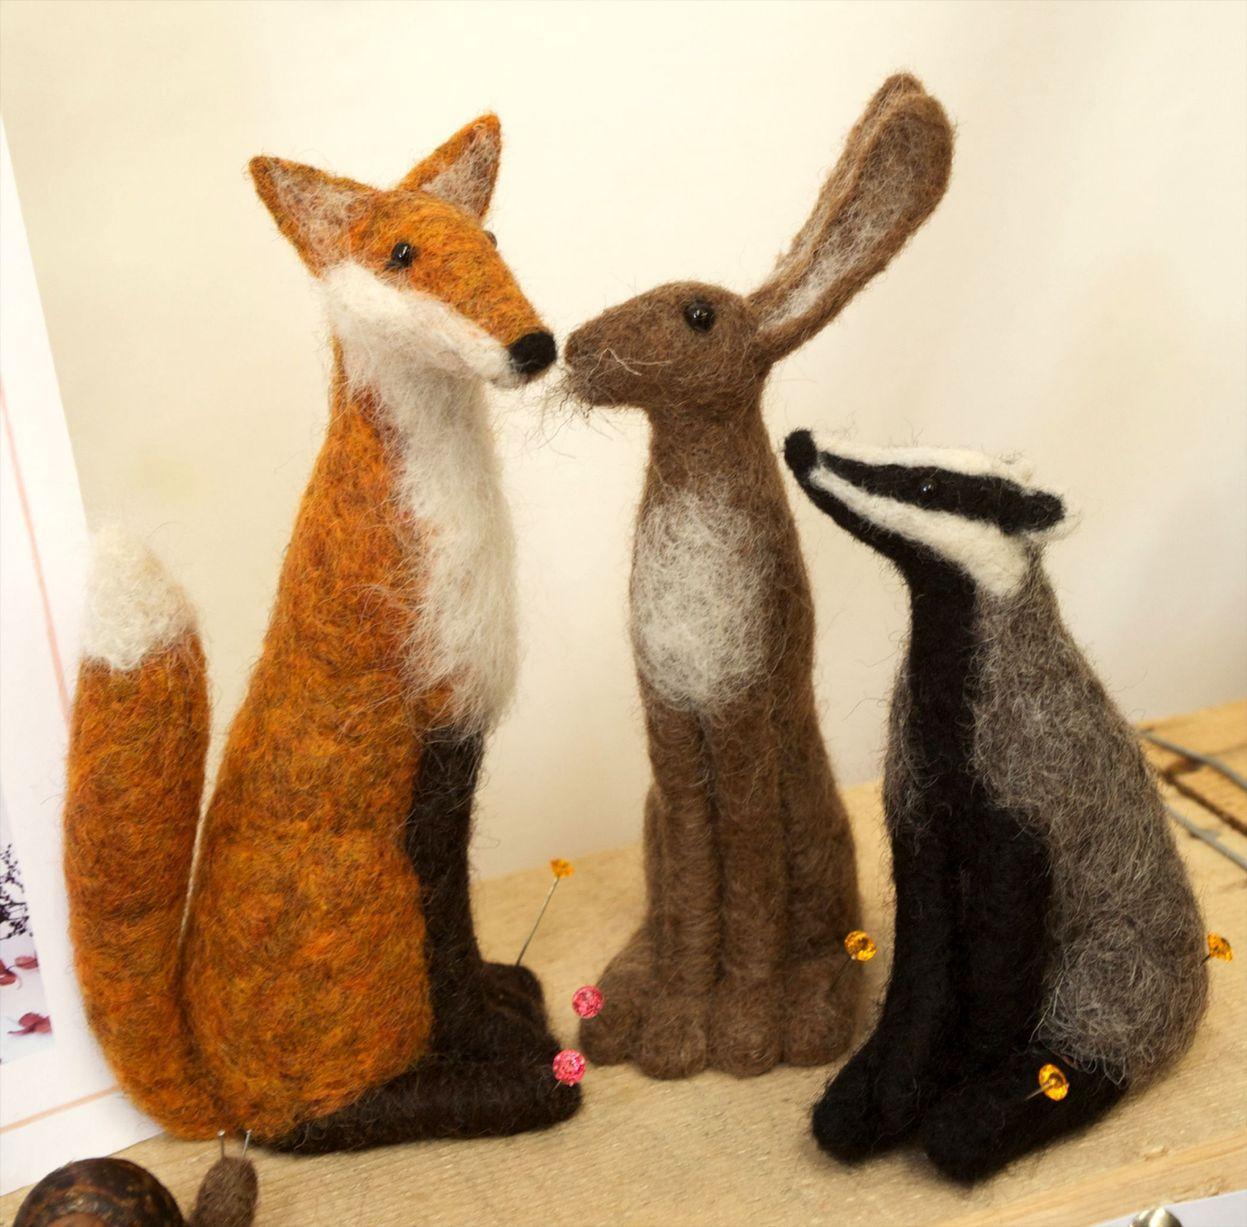 LOOK: Wool art like you've never seen before